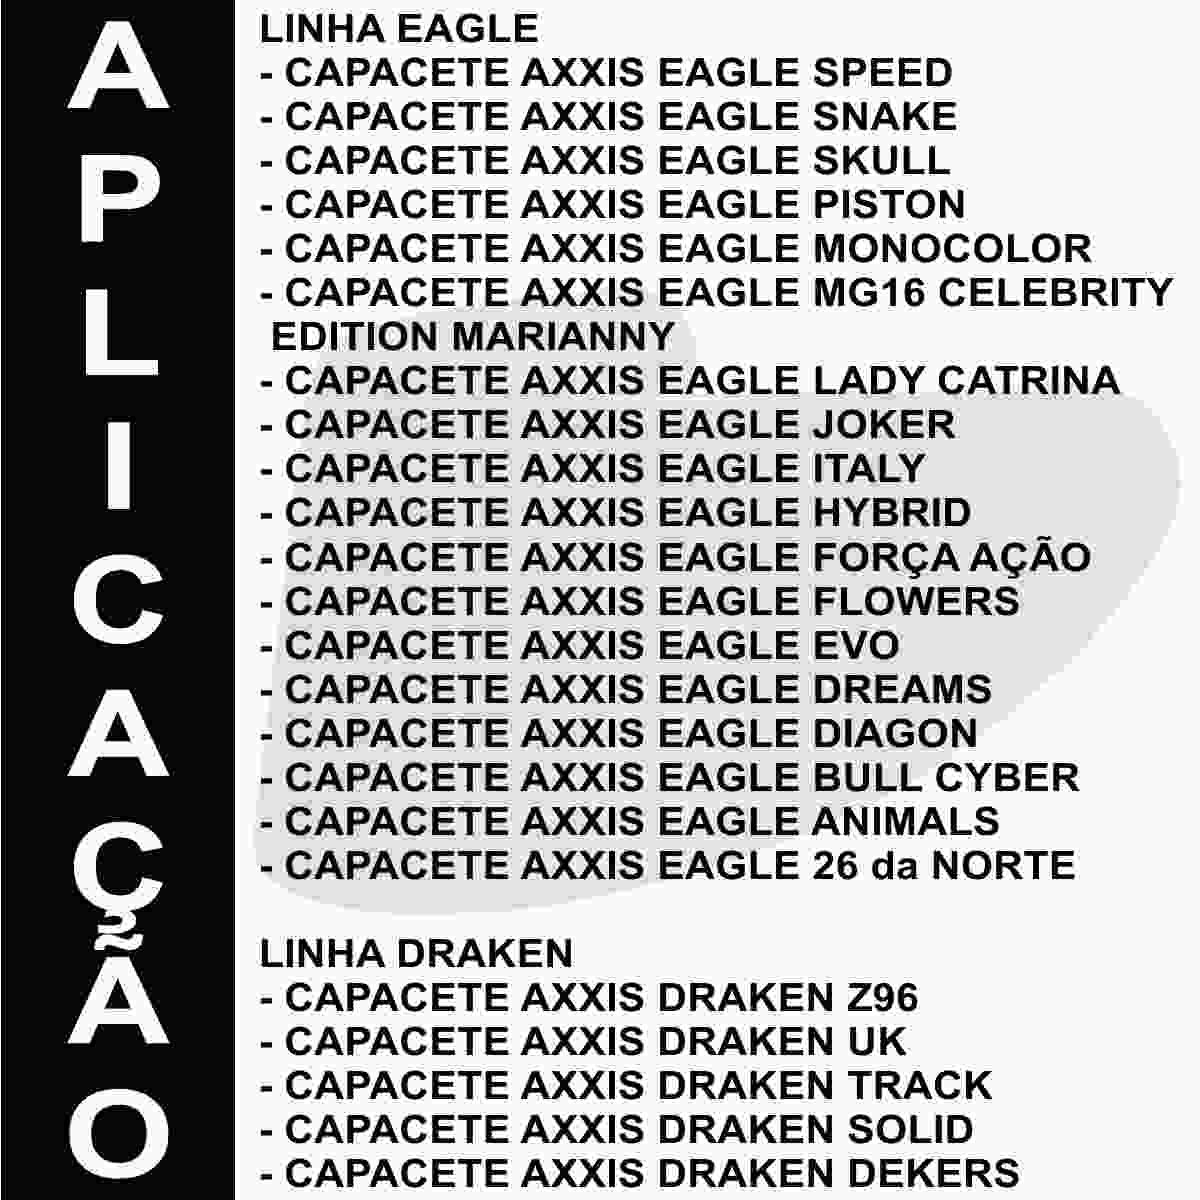 KIT VISEIRA AXXIS EAGLE/DRAKEN IRIDIUM CAMALEÃO V18 + VISEIRA CLEAR CRISTAL